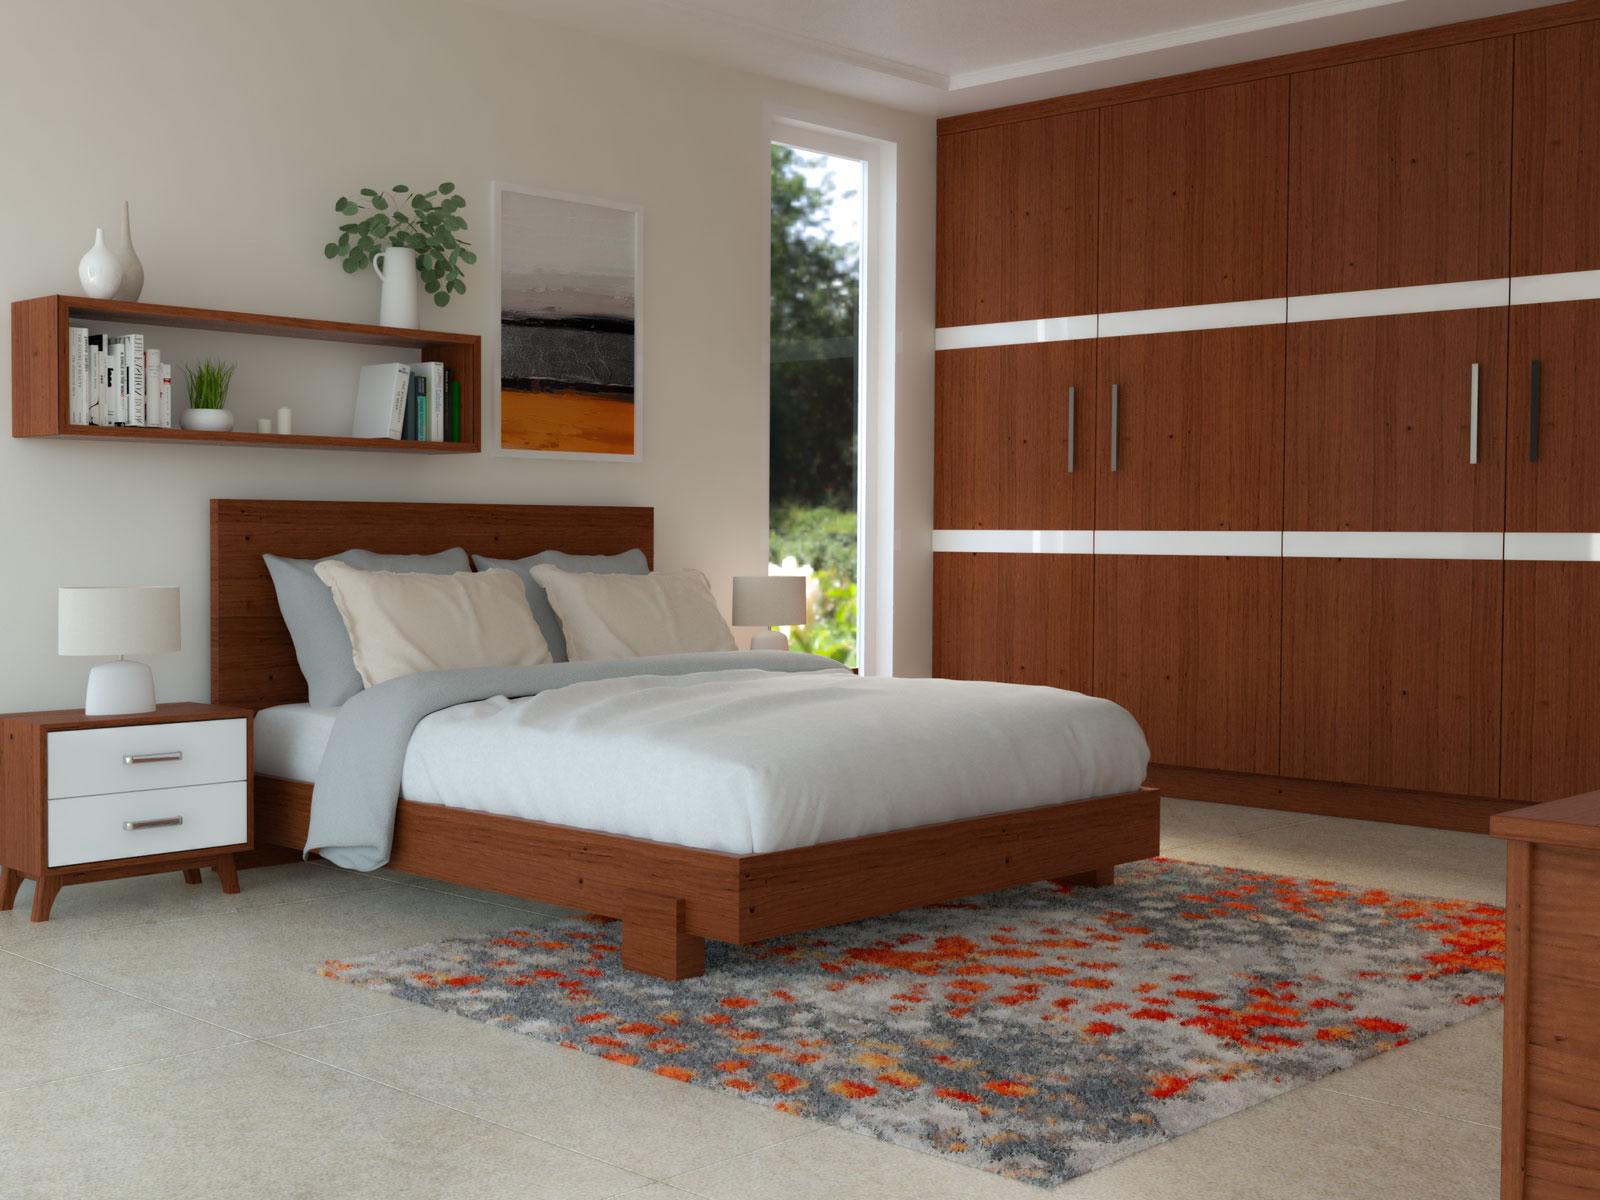 Bedroom with cherry furnishings and orange rug